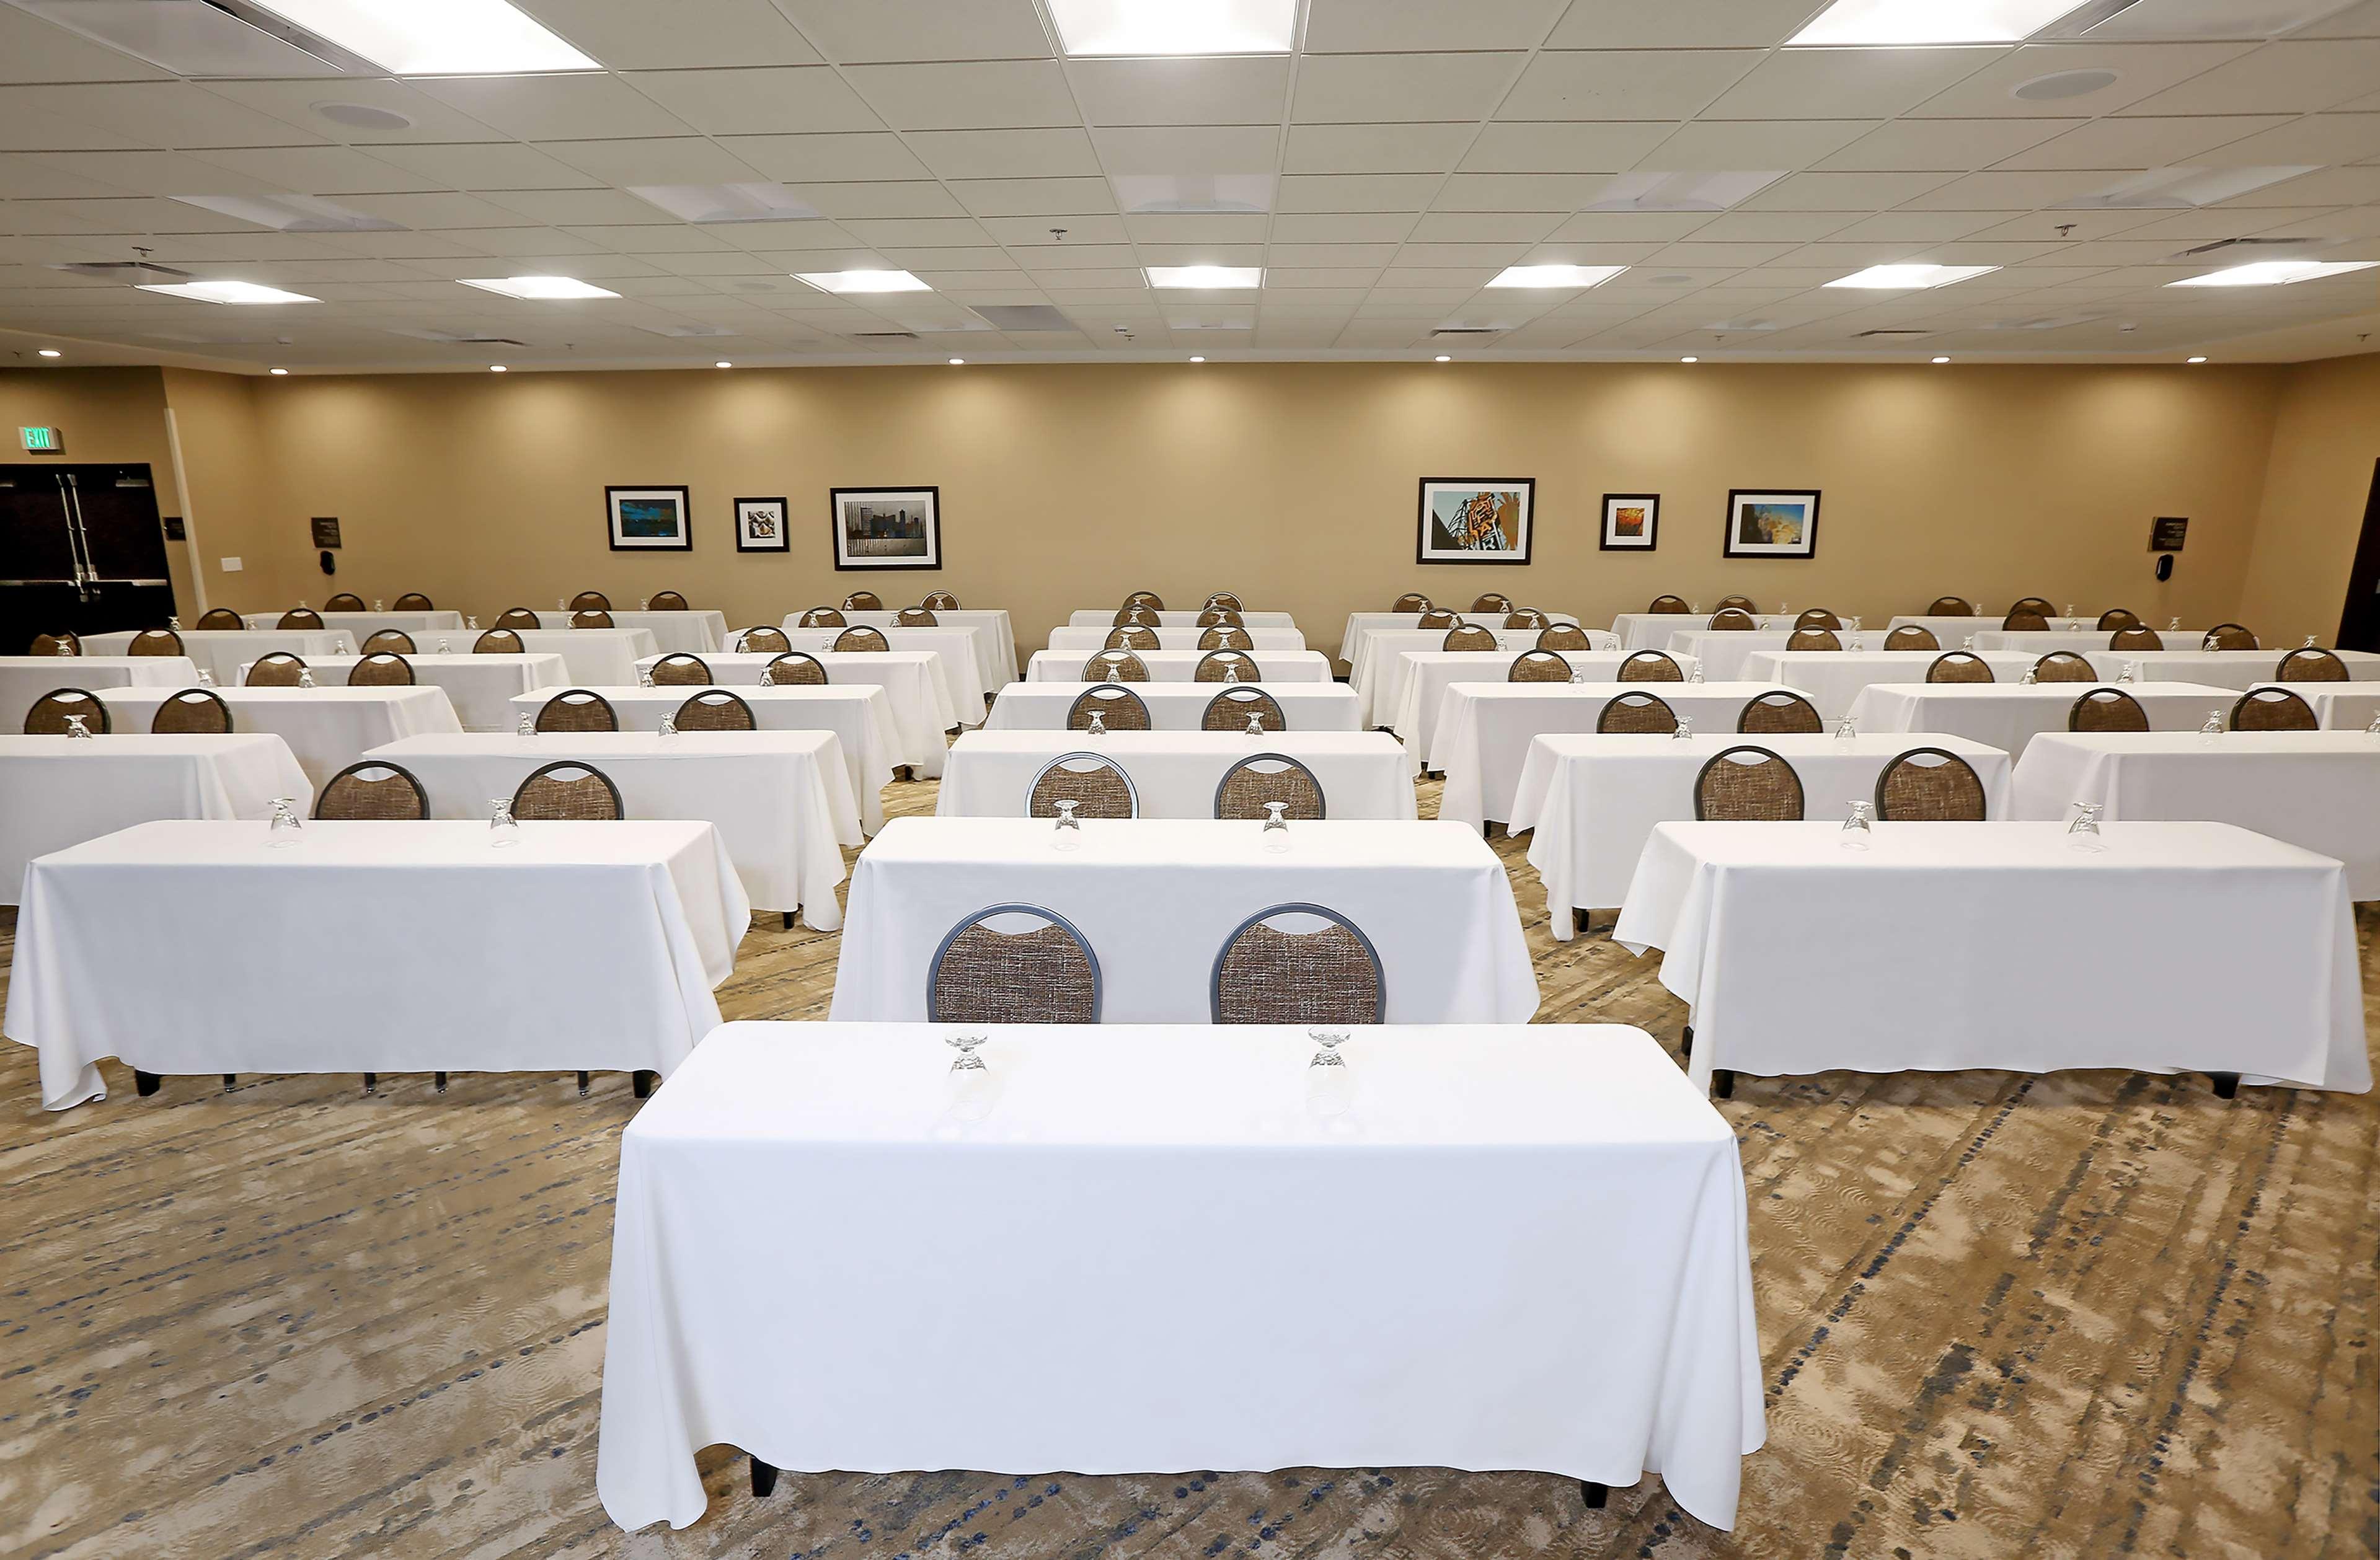 DoubleTree by Hilton West Fargo image 30